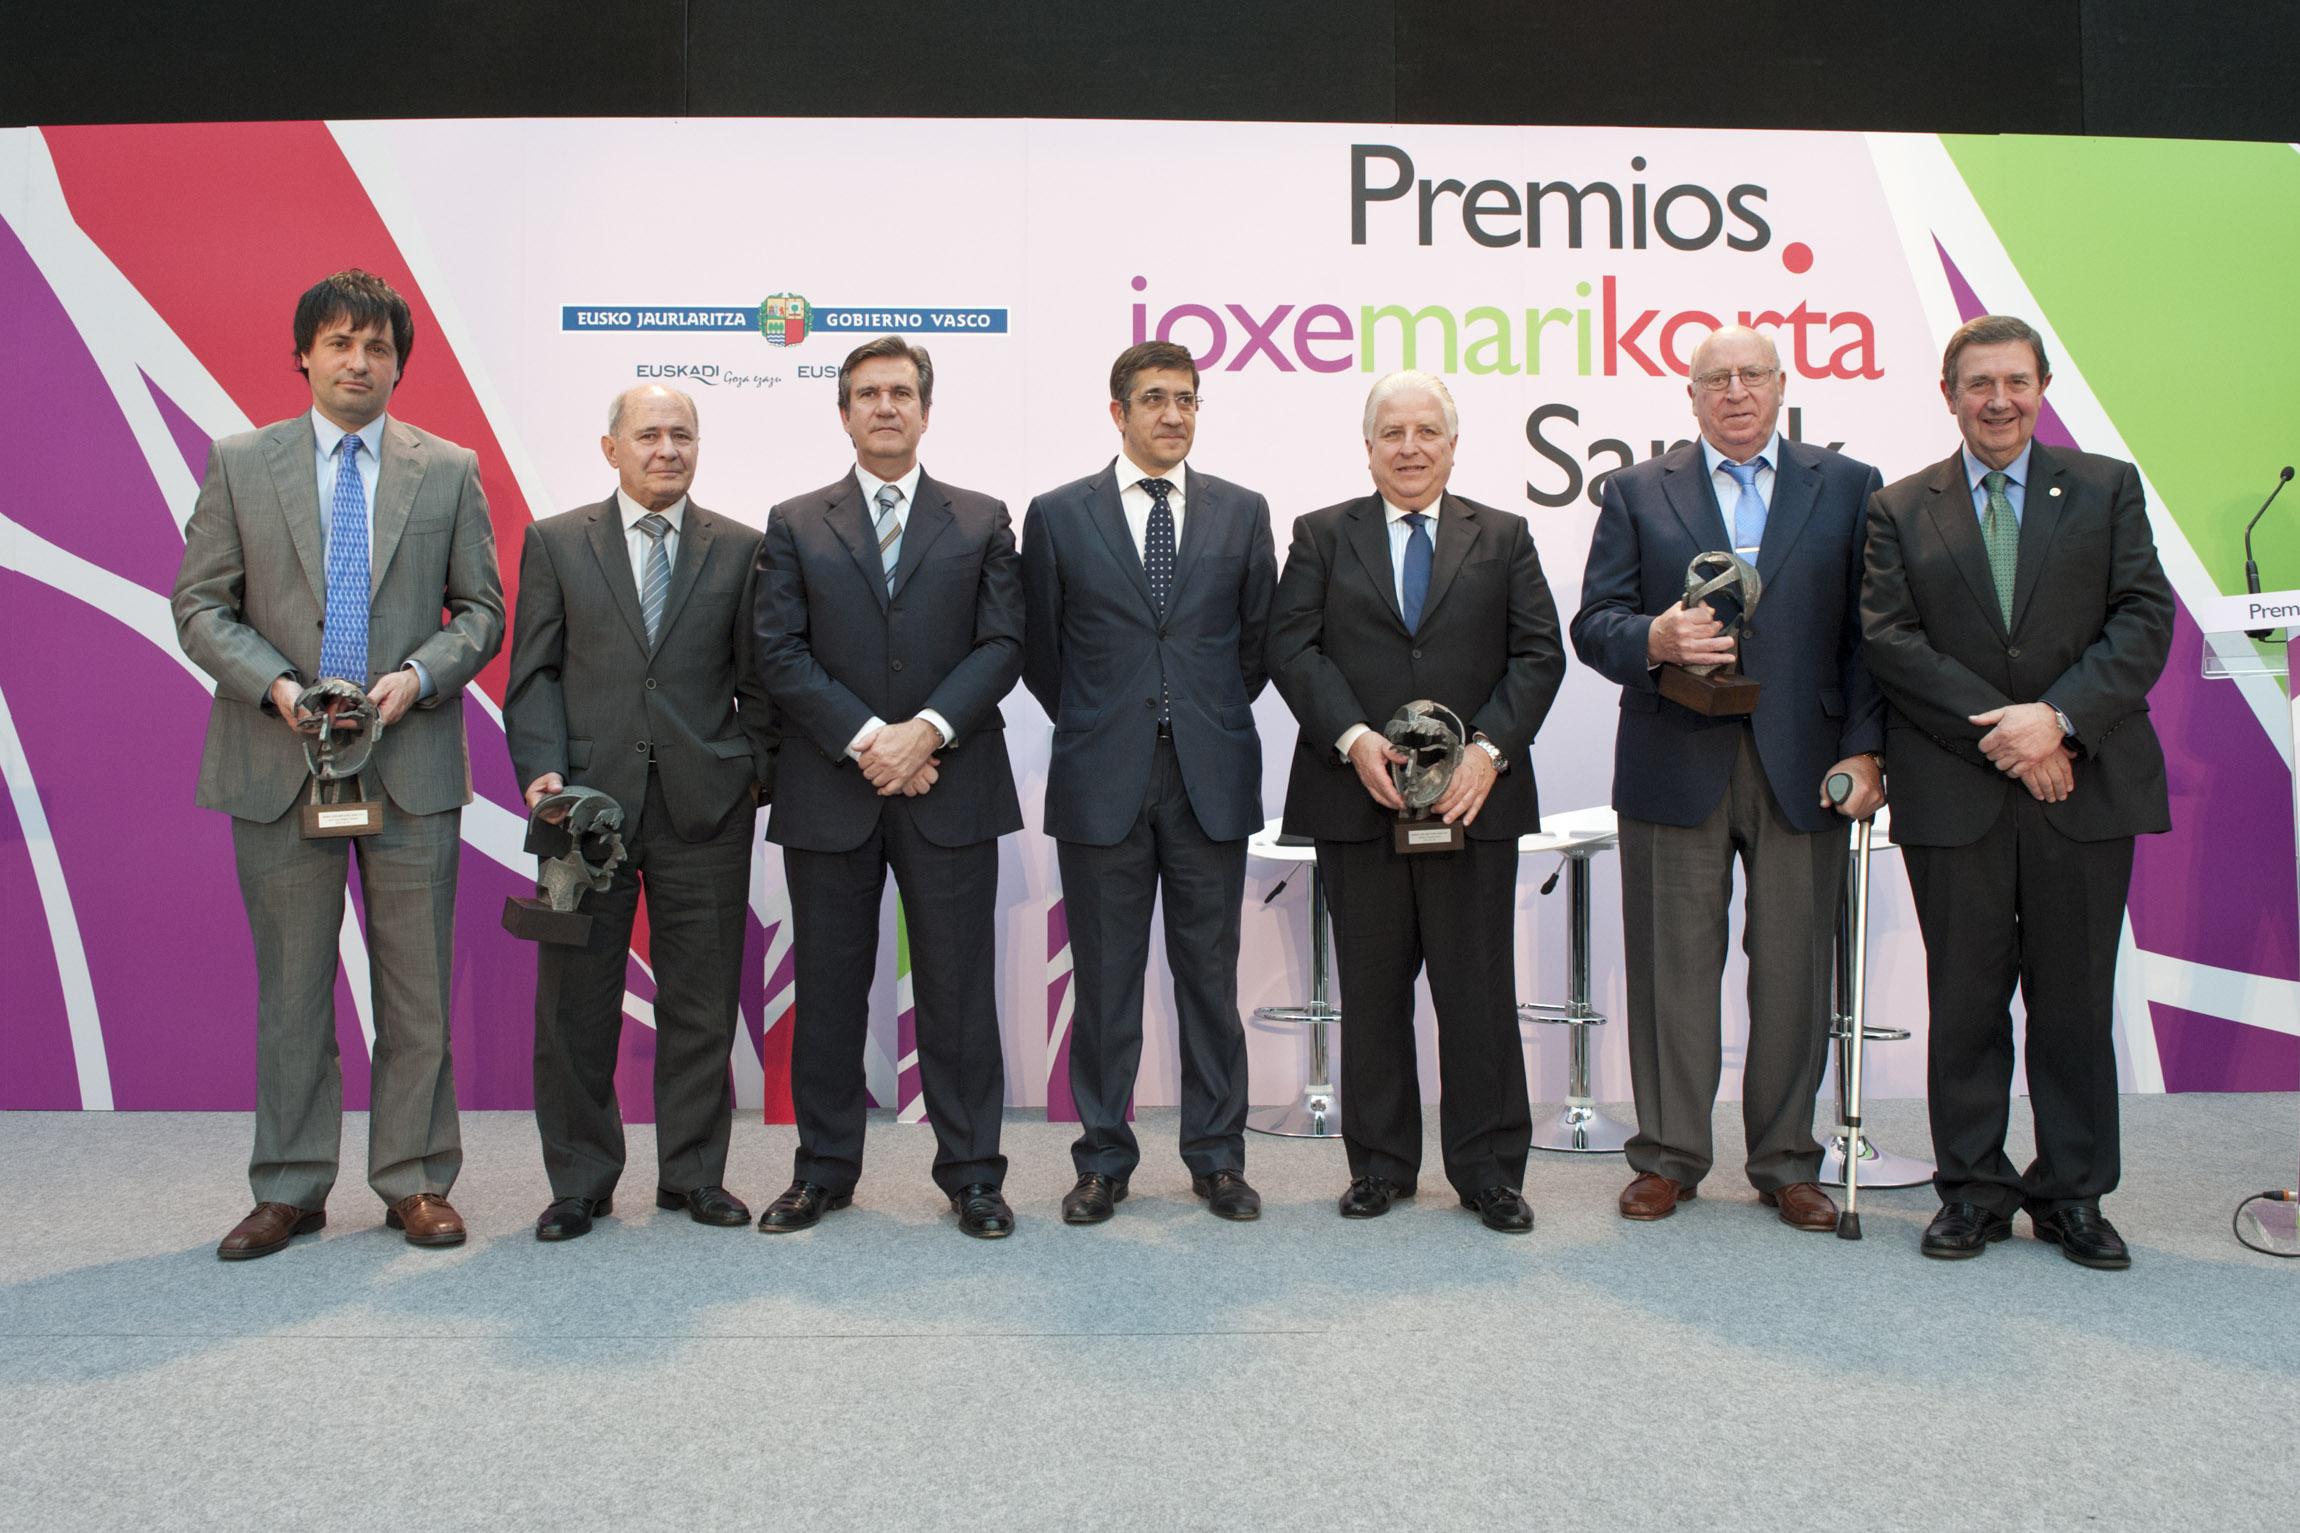 2011_06_29_lehen_premios_korta_09.jpg